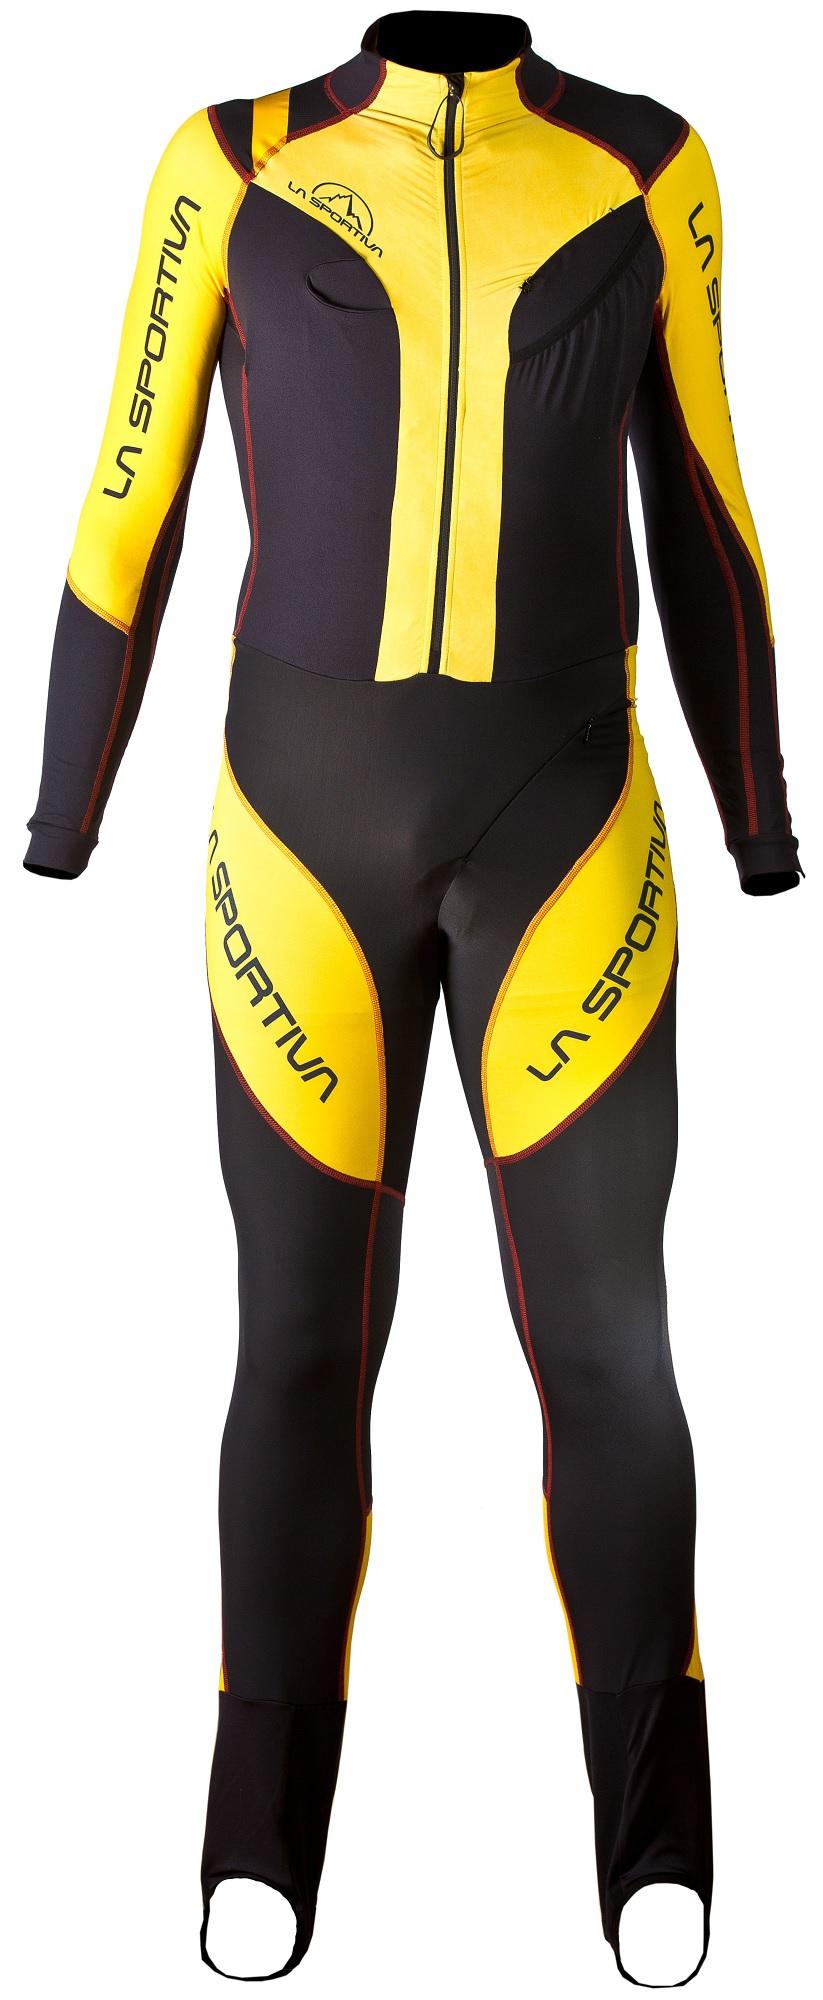 La Sportiva Syborg Racing Suit